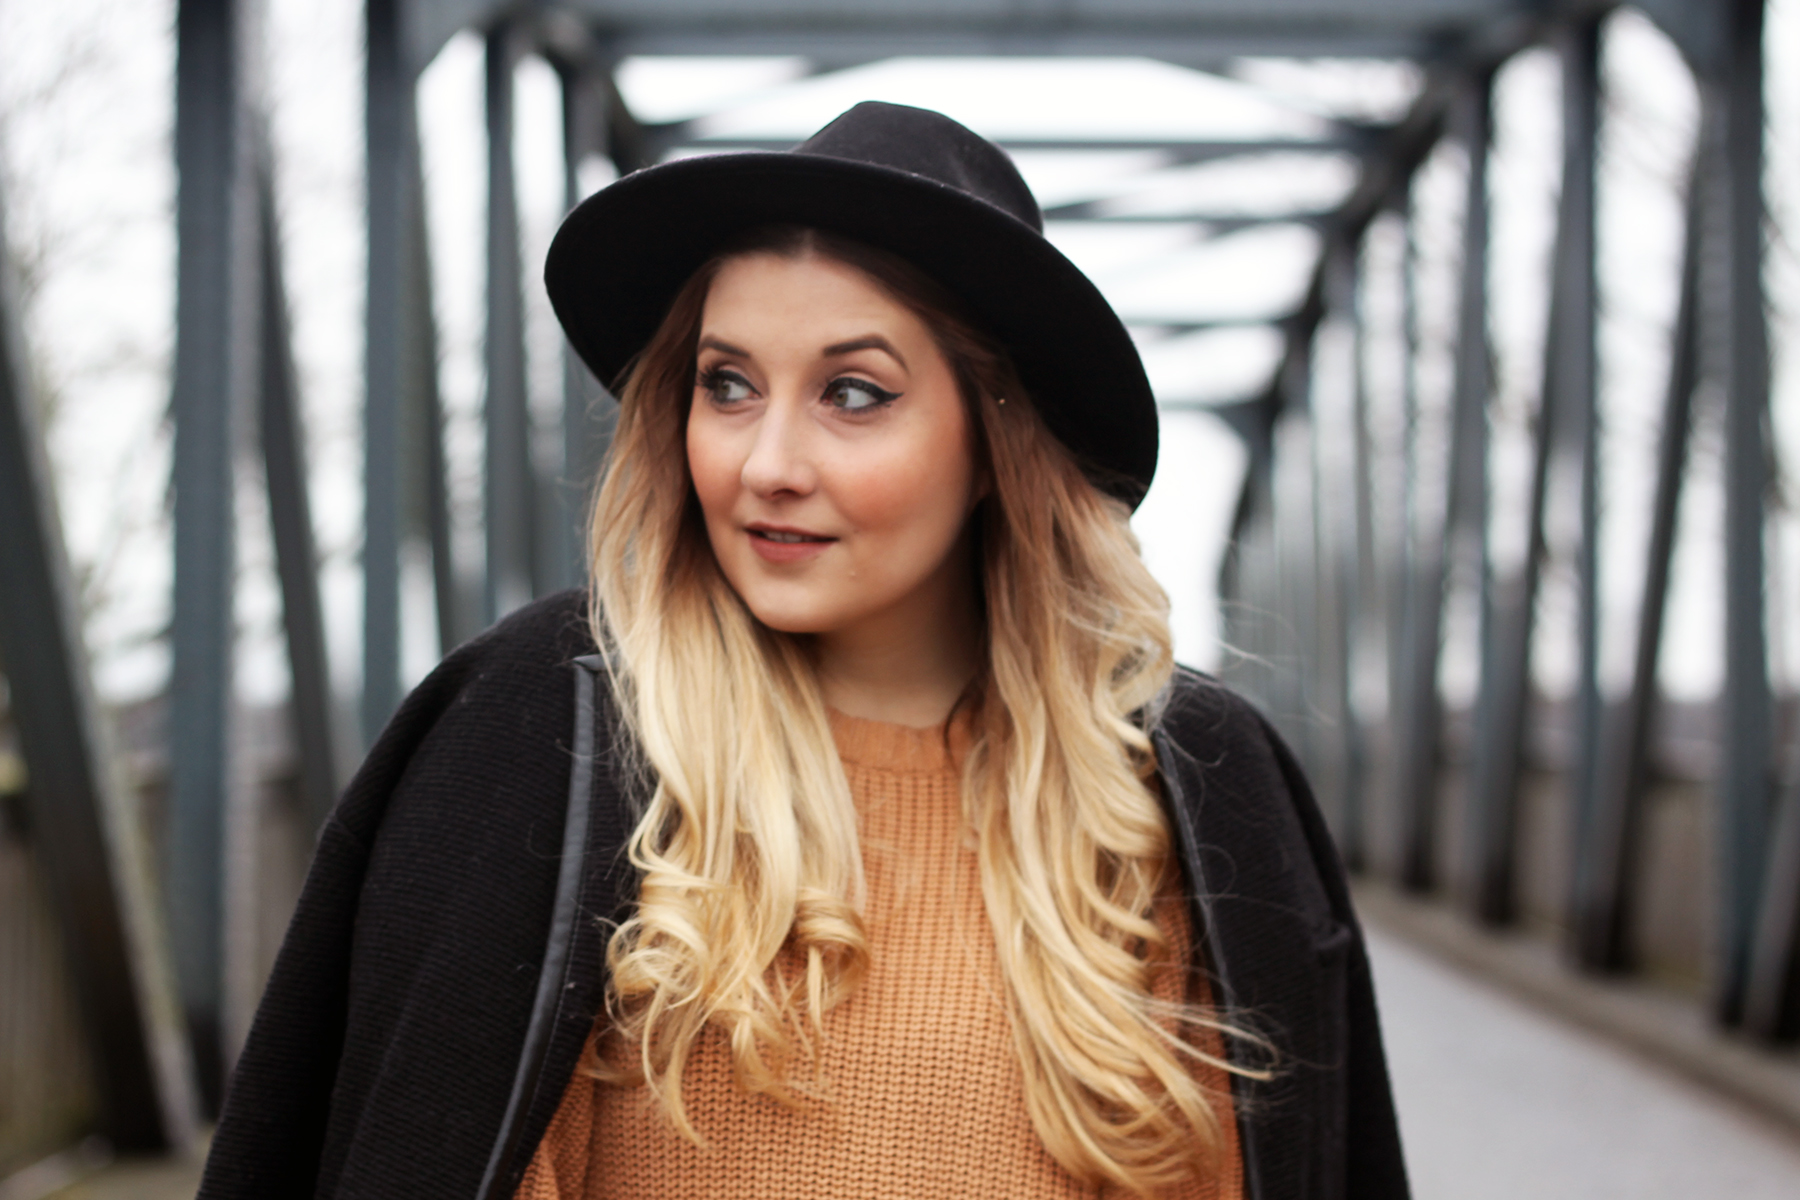 outfit-look-style-hut-fashionblog-modeblog-ombre-locken-glätteisen